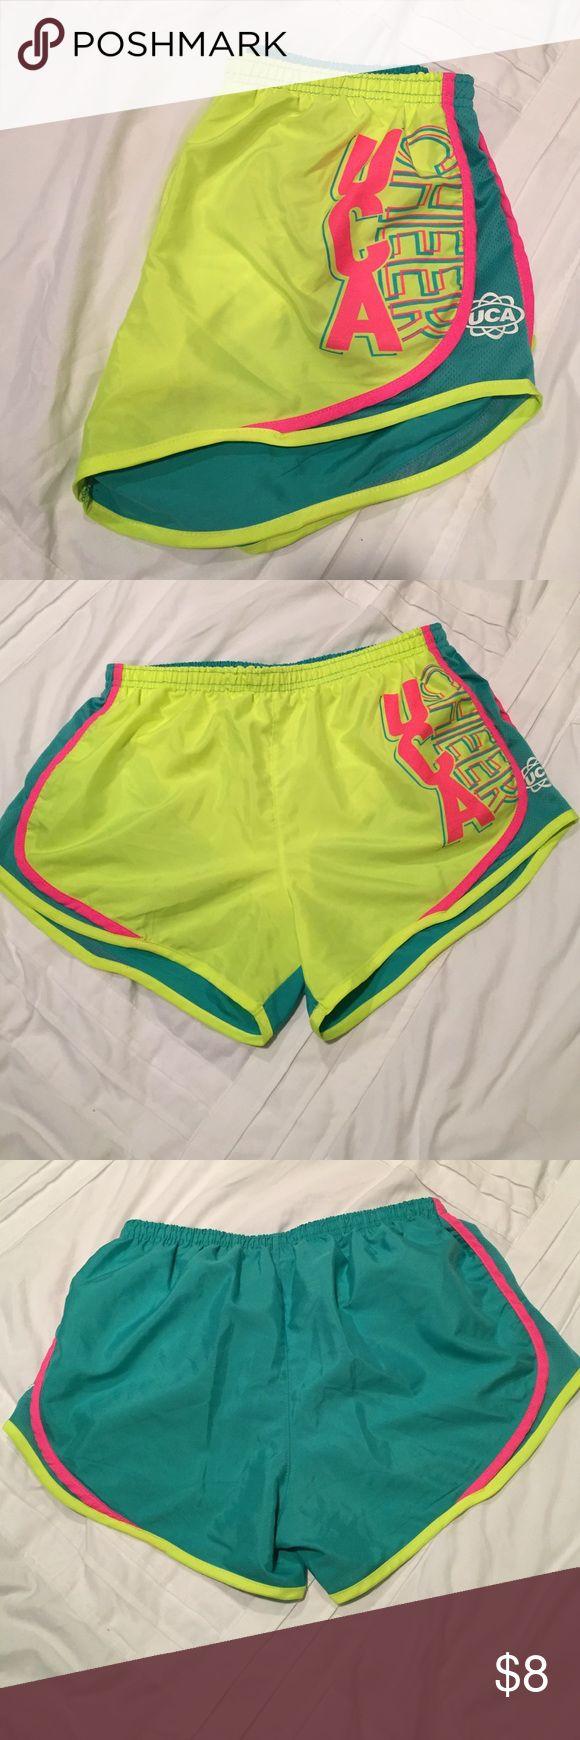 Varsity UCA Cheer Active Shorts NEW, UCA Cheer shorts, bright neon color, runs small (says large but probably more of a medium), inside liner, drawstring to tighten Varsity Shorts